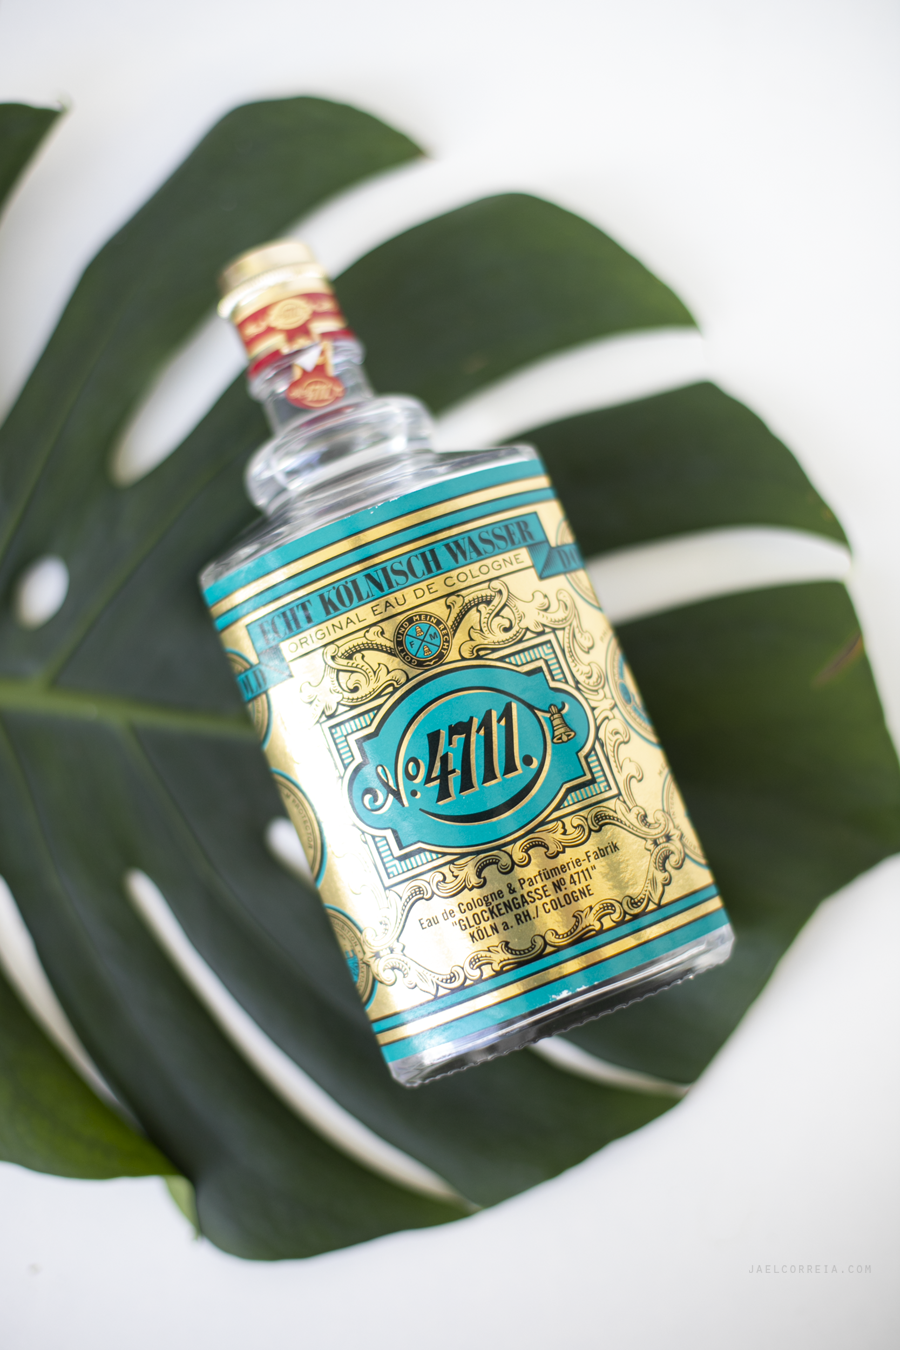 4711 Original cologne colonia tom ford portofino porto fino dupe copia inspiraçao perfume parfum portugal unissex inspired